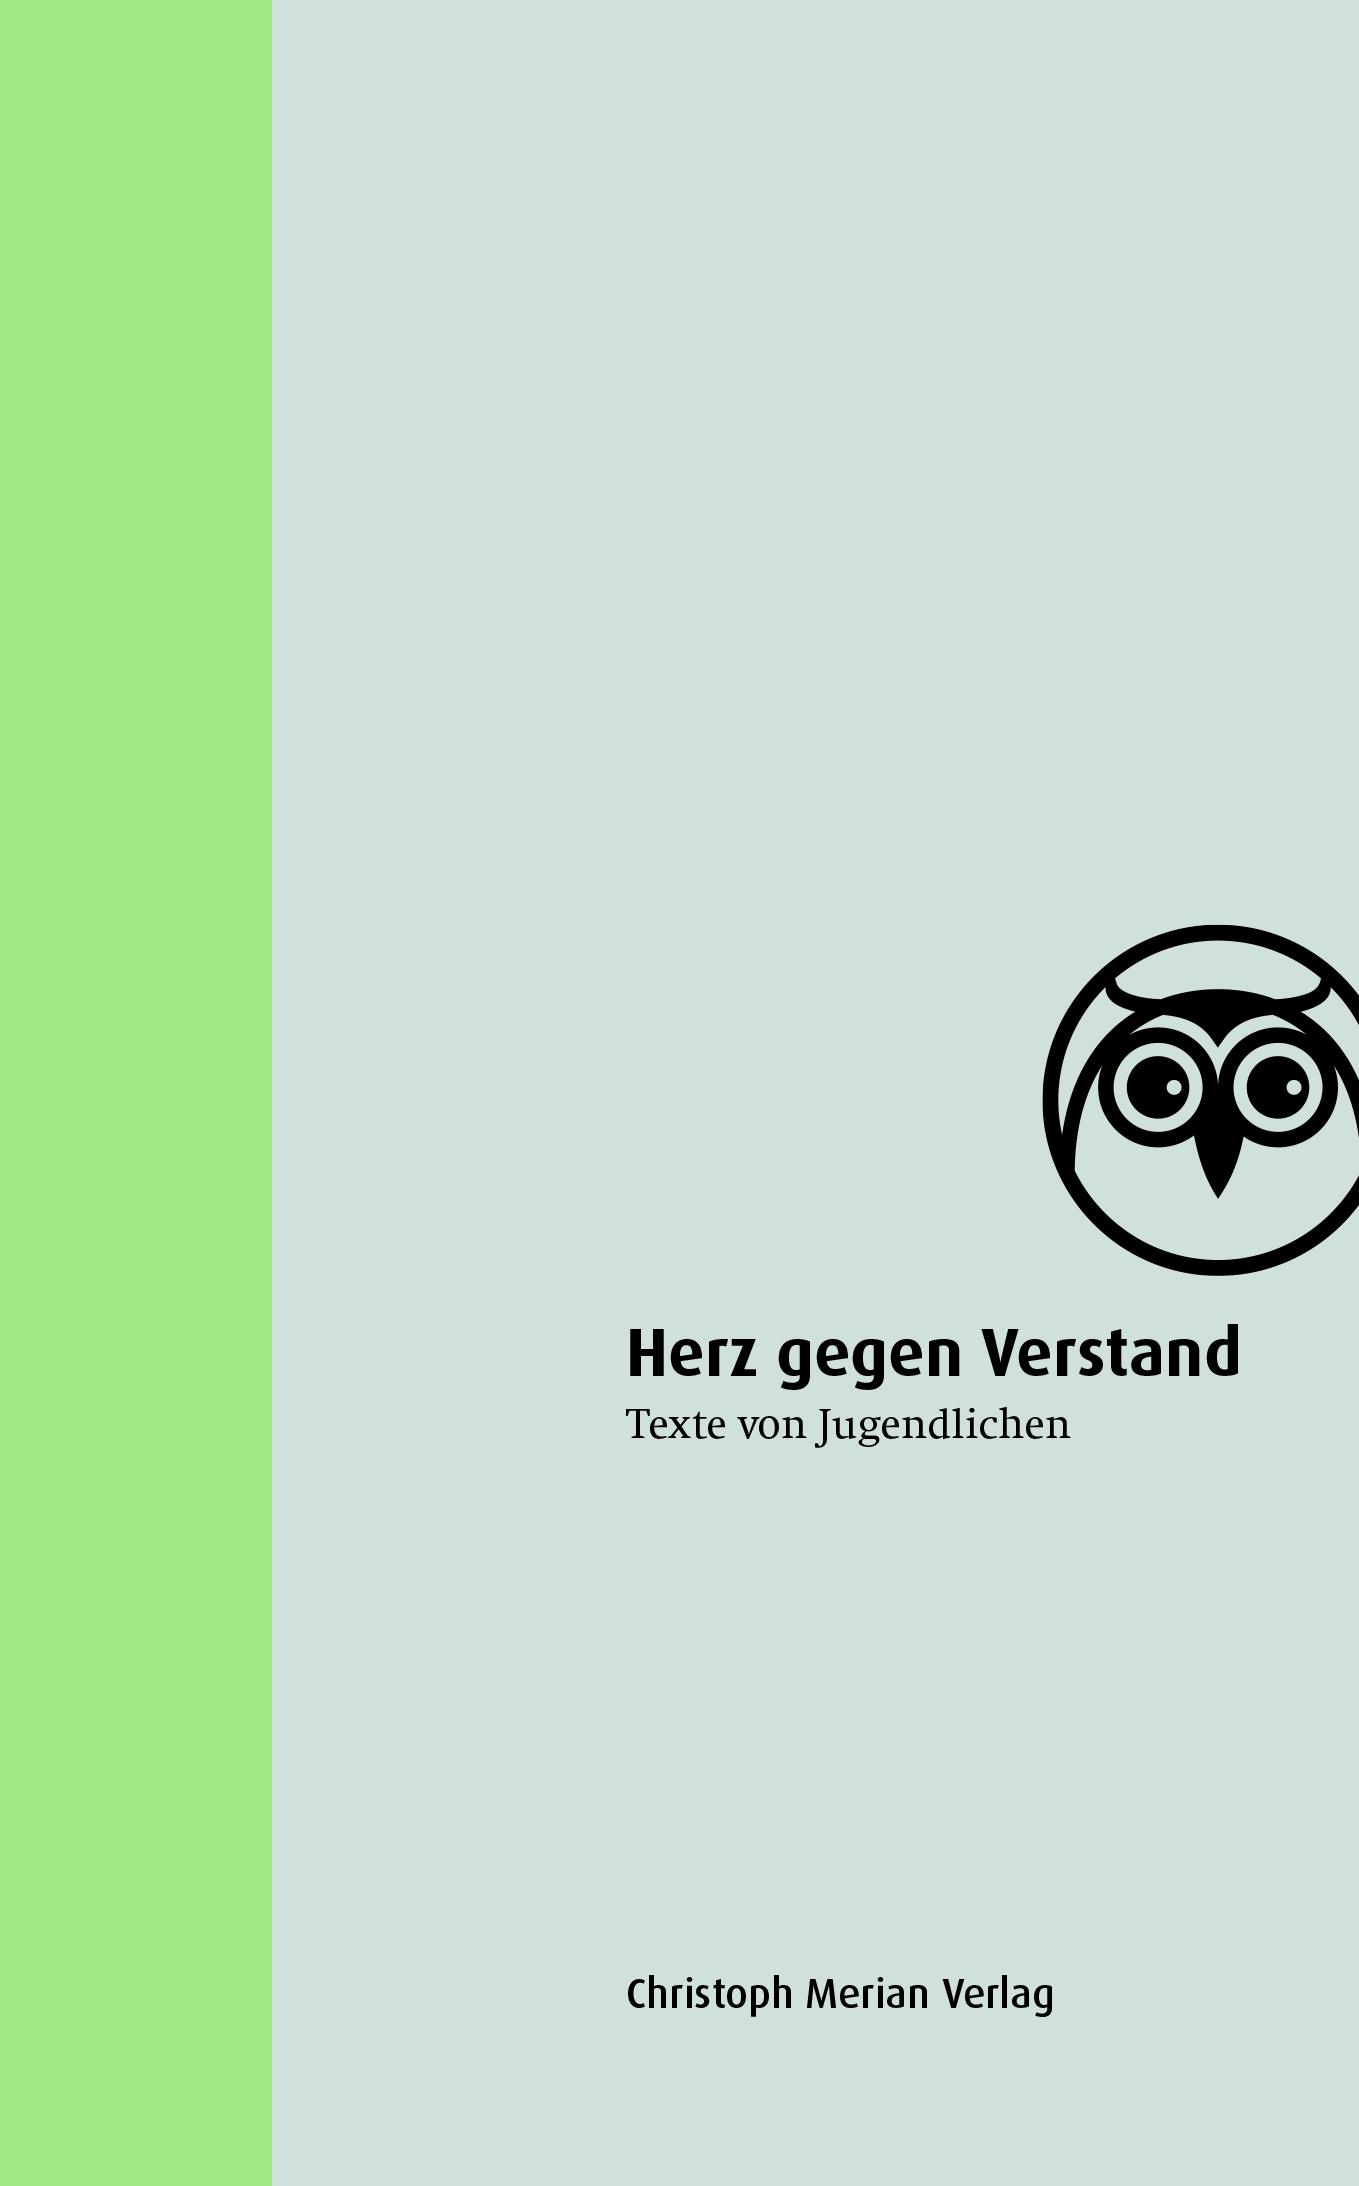 Herz gegen Verstand - Presse - Infos - Christoph Merian Verlag